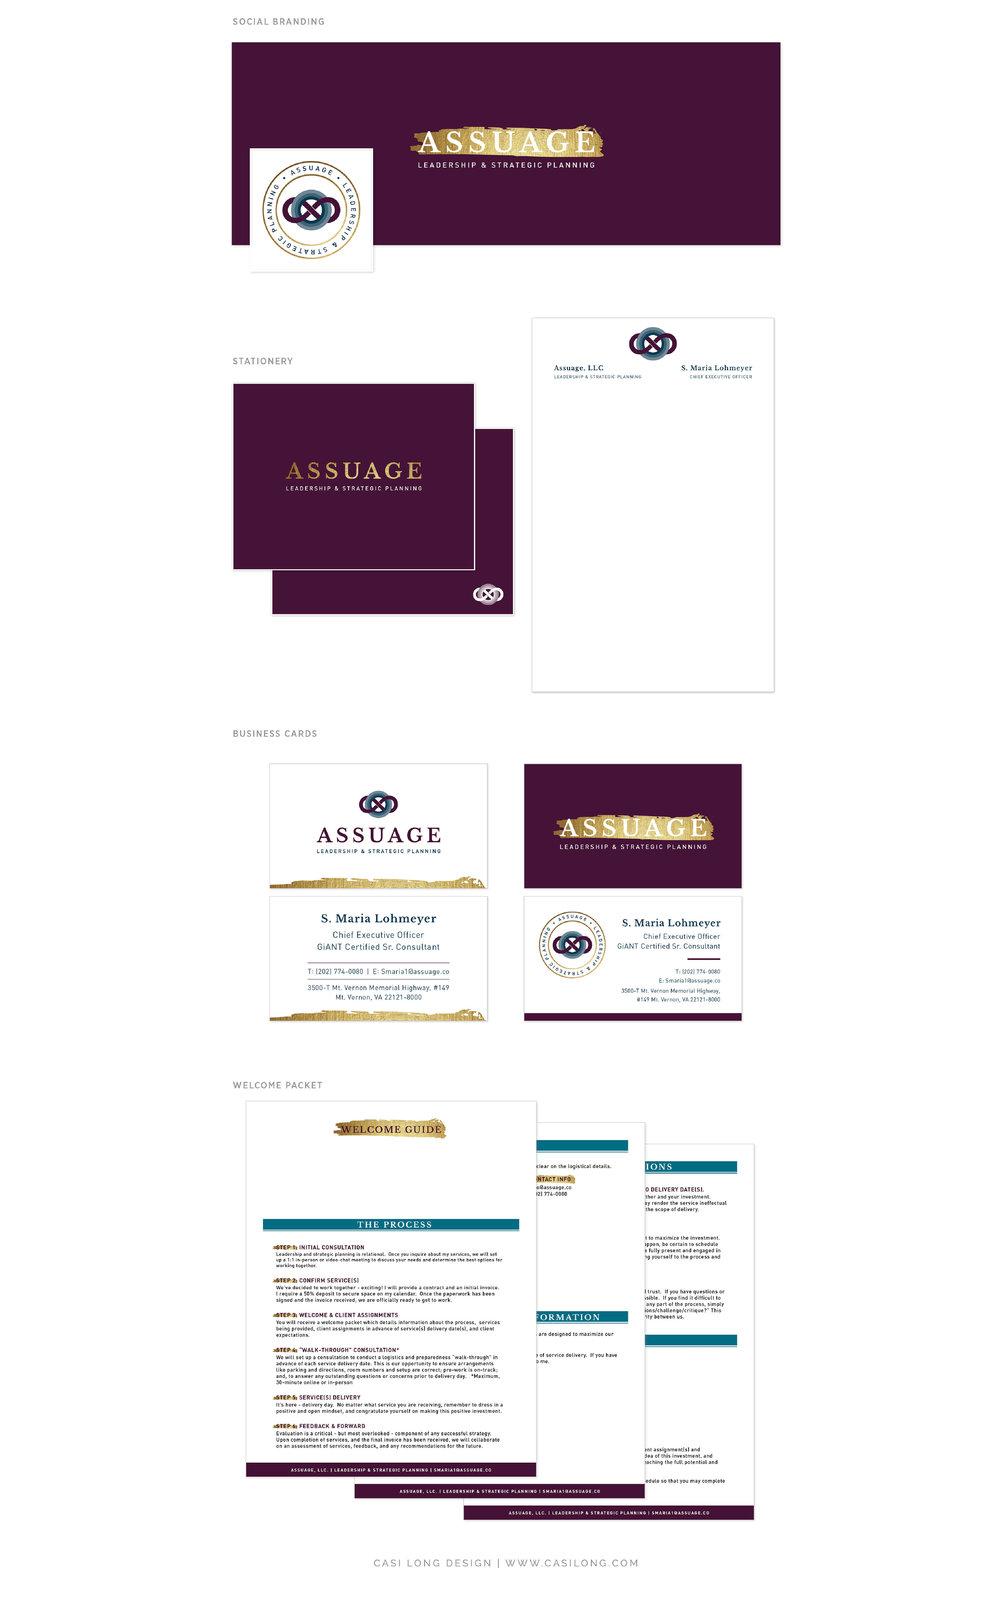 Assuage Branding by Casi Long Design | casilong.com 4.jpg